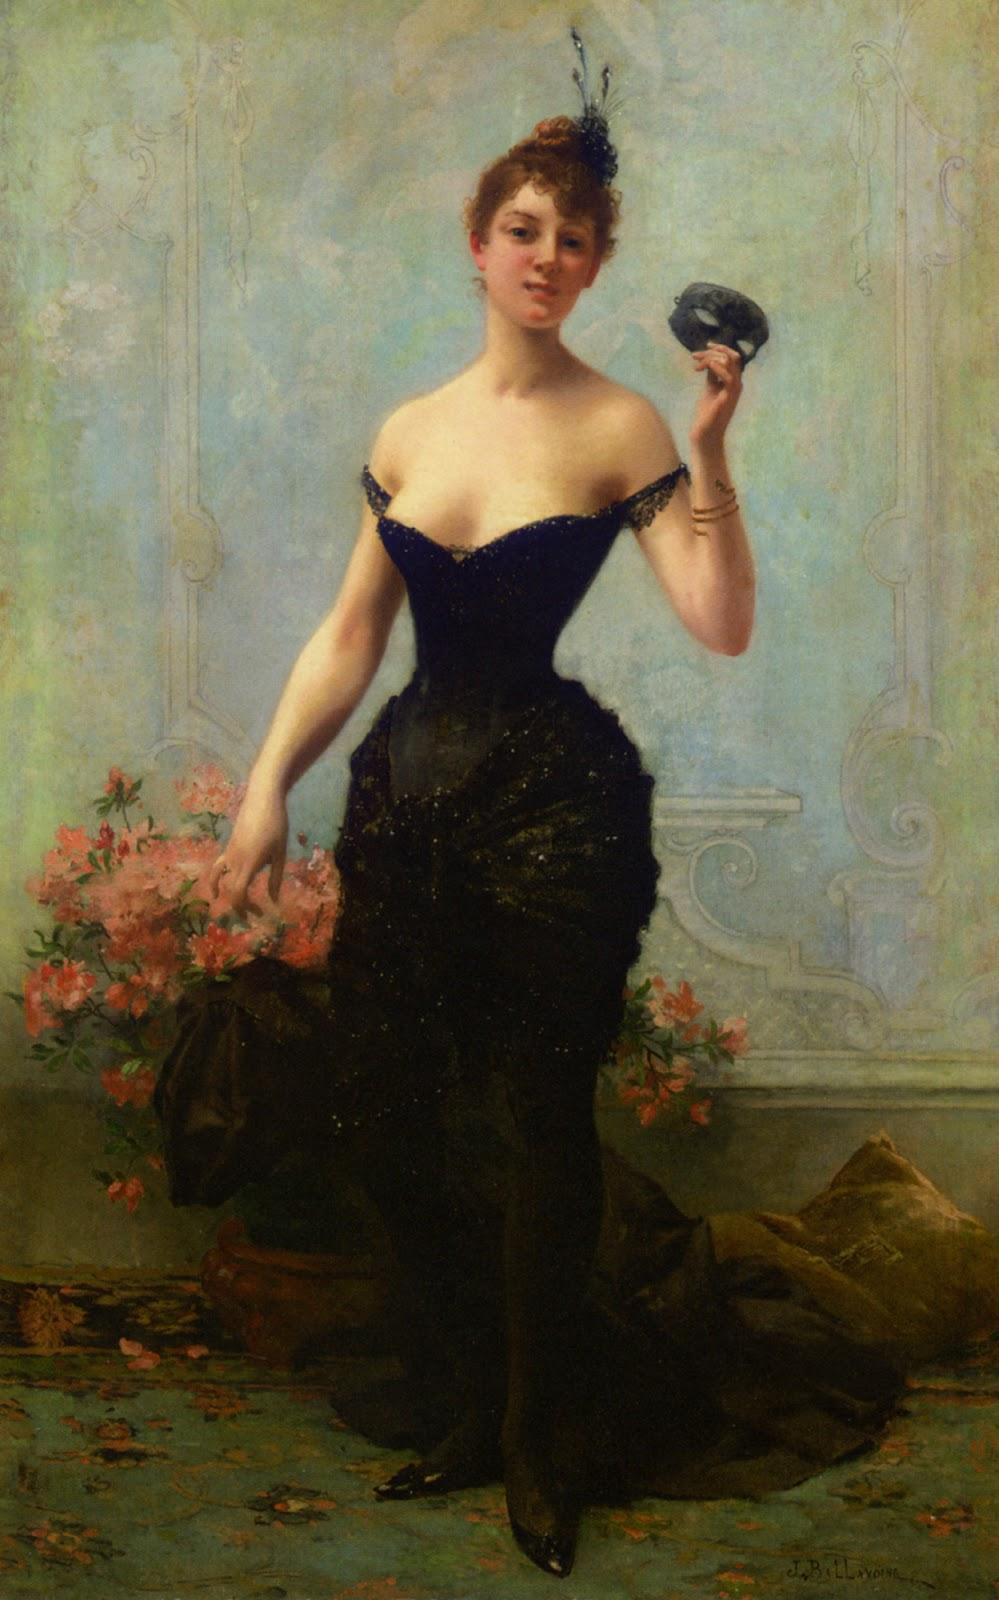 Jules Frederic Ballavoine (1855-1901)